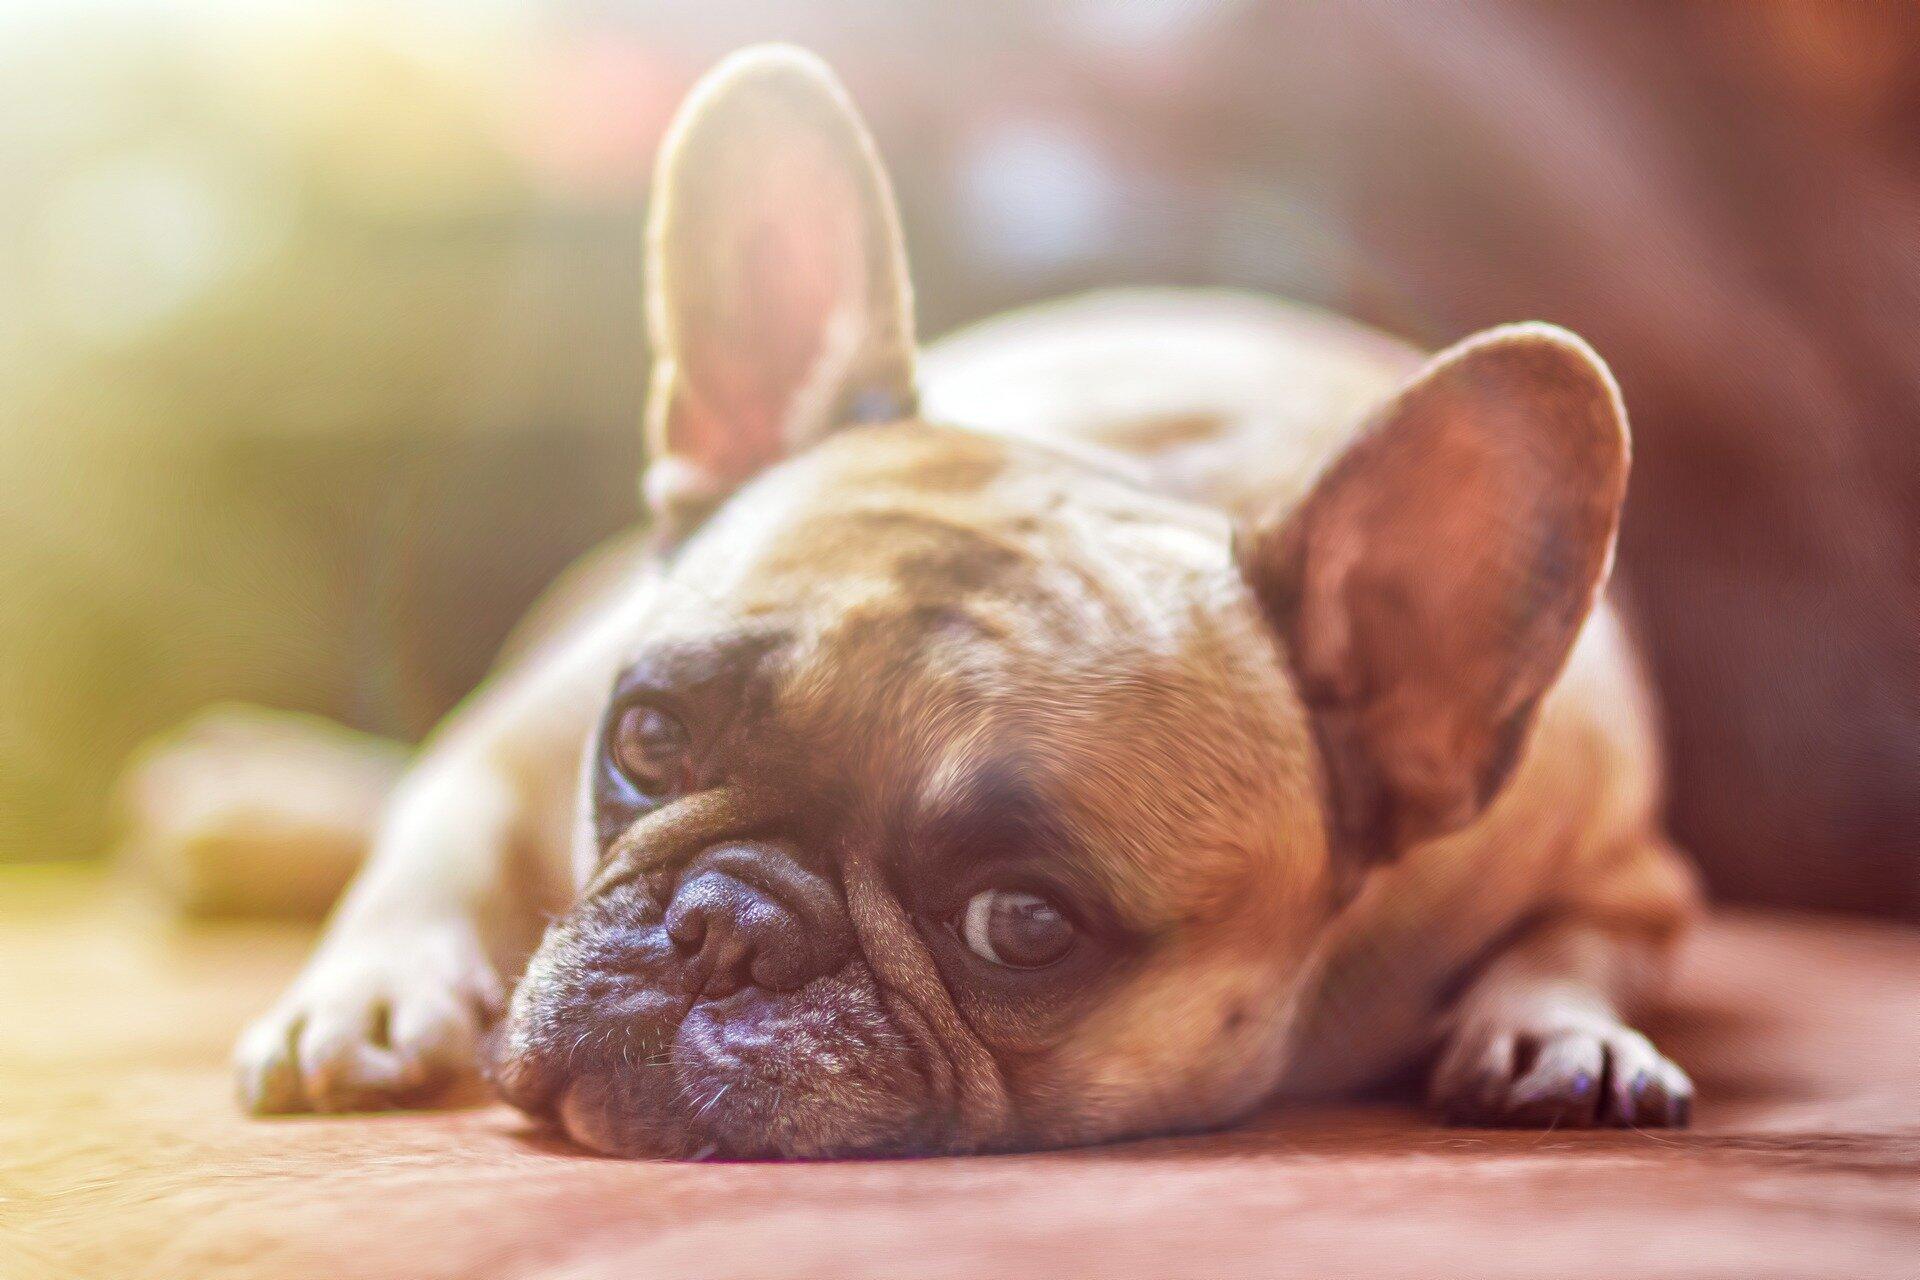 Researchers find CBD improves arthritis symptoms in dogs